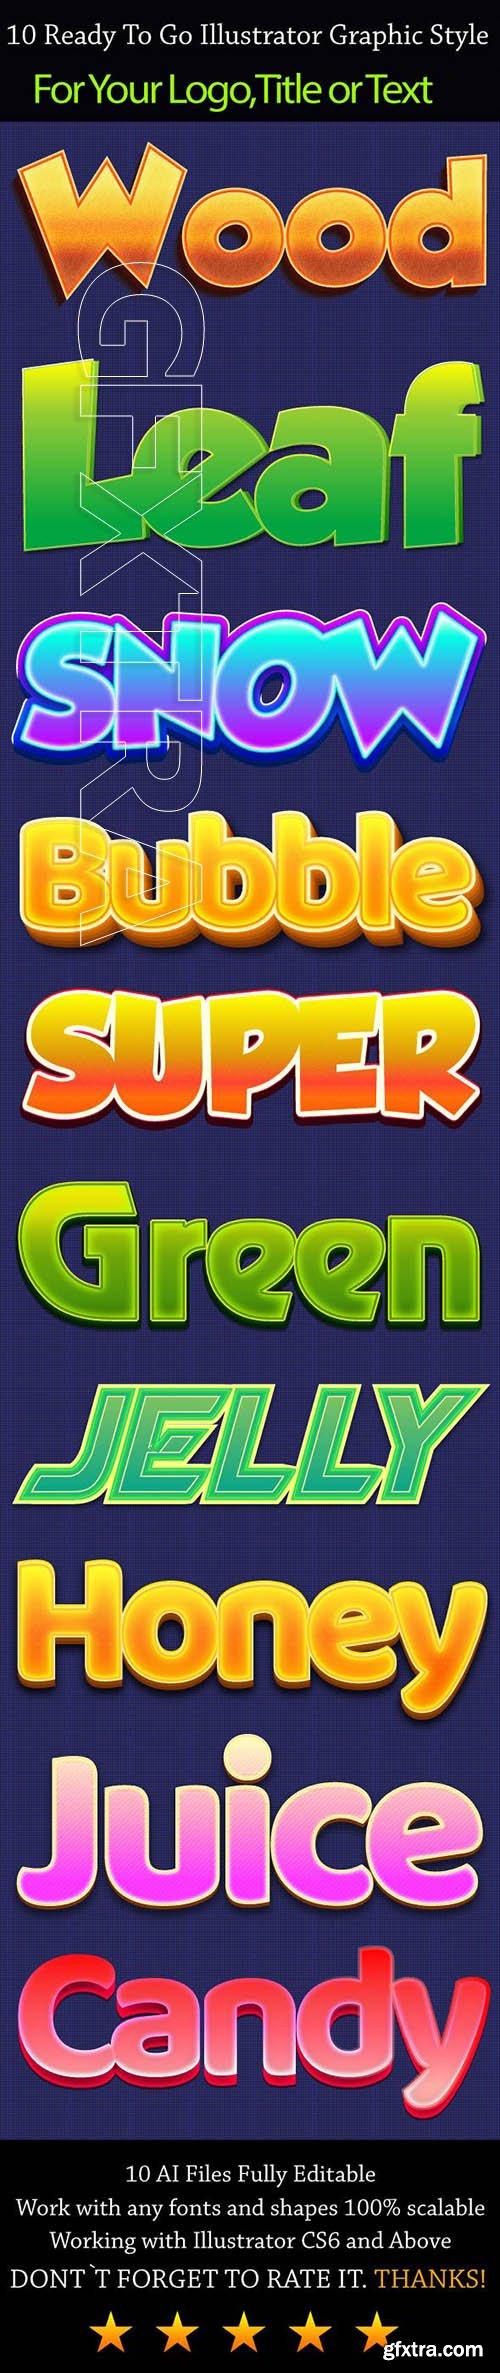 GraphicRiver - 10 Glossy Illustrator Graphic Styles 23591008